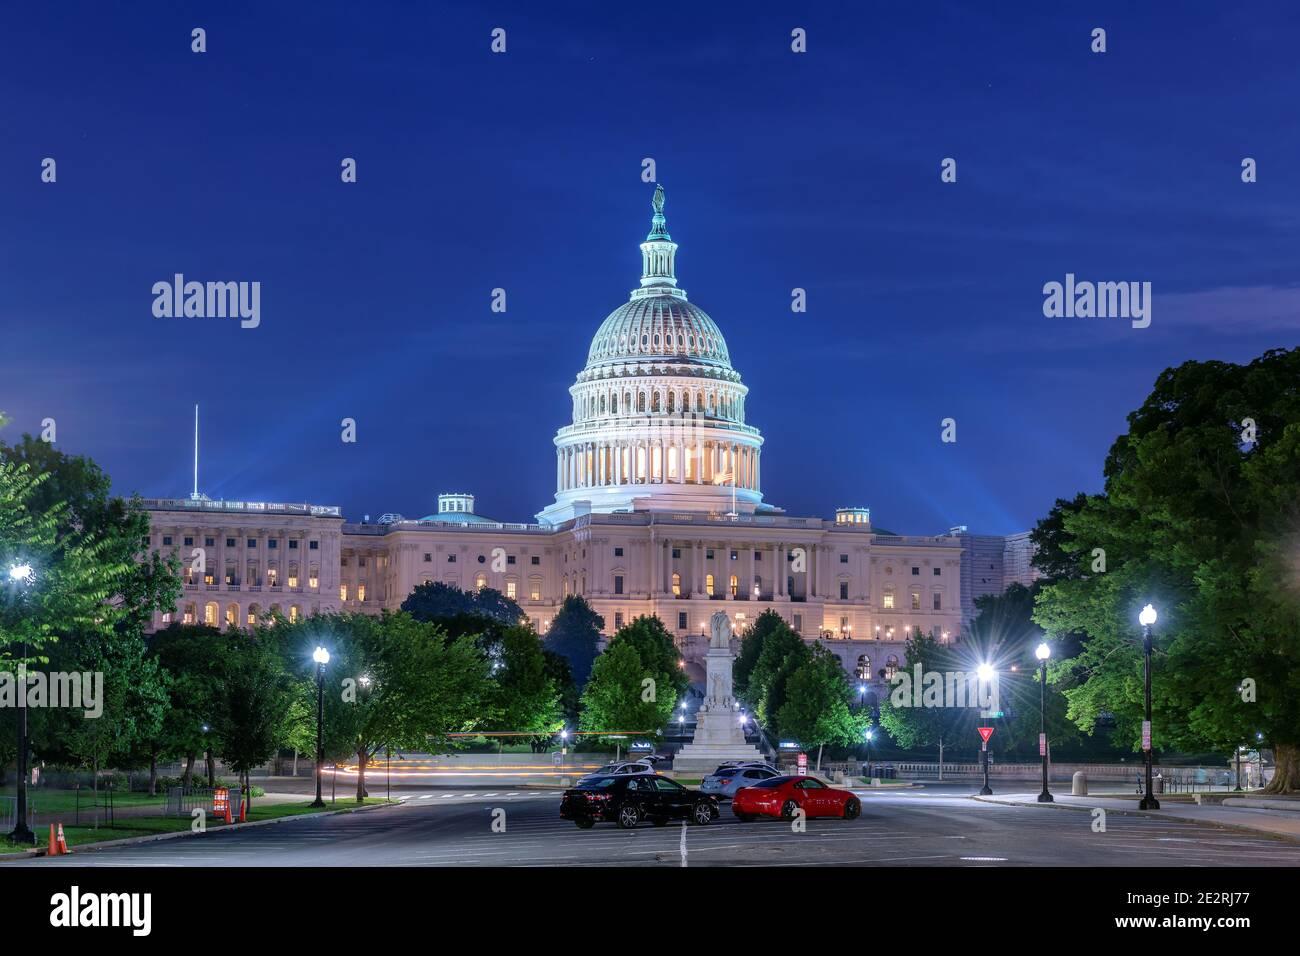 The United States Capitol building at night, Washington DC, USA. Stock Photo